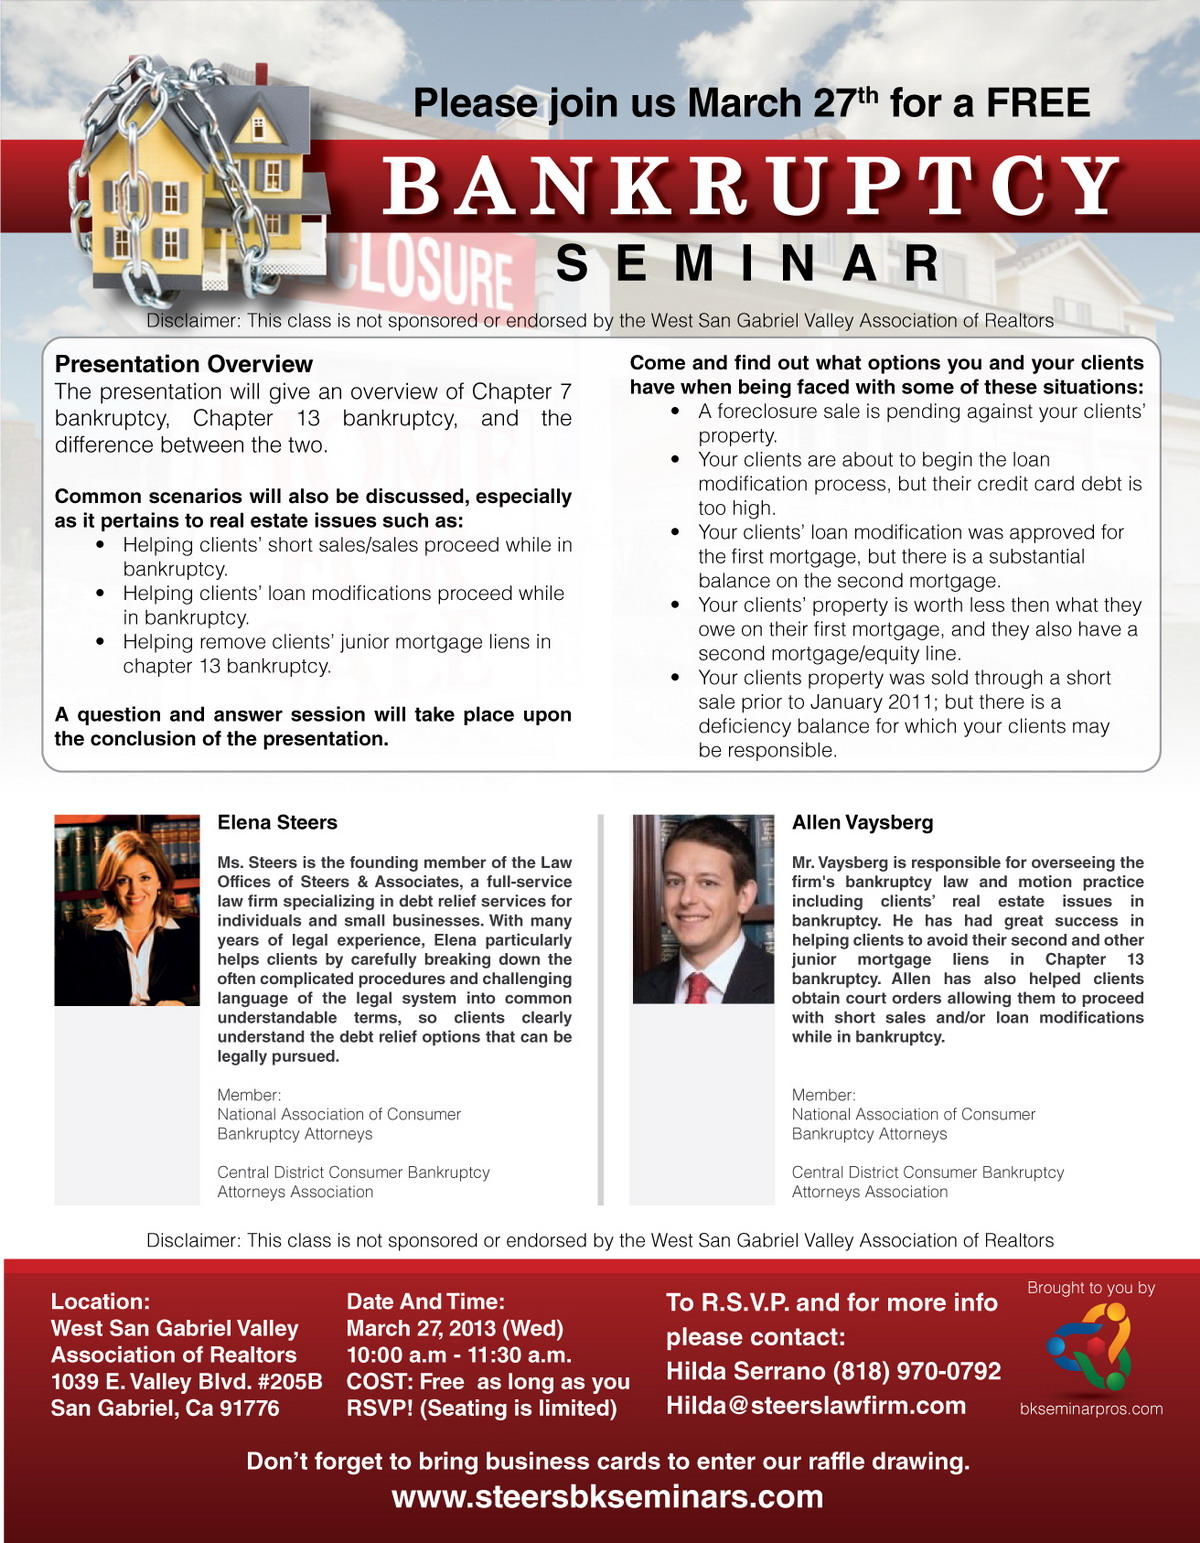 Bankruptcy Workshop March 27 2013 in San Gabriel Valley